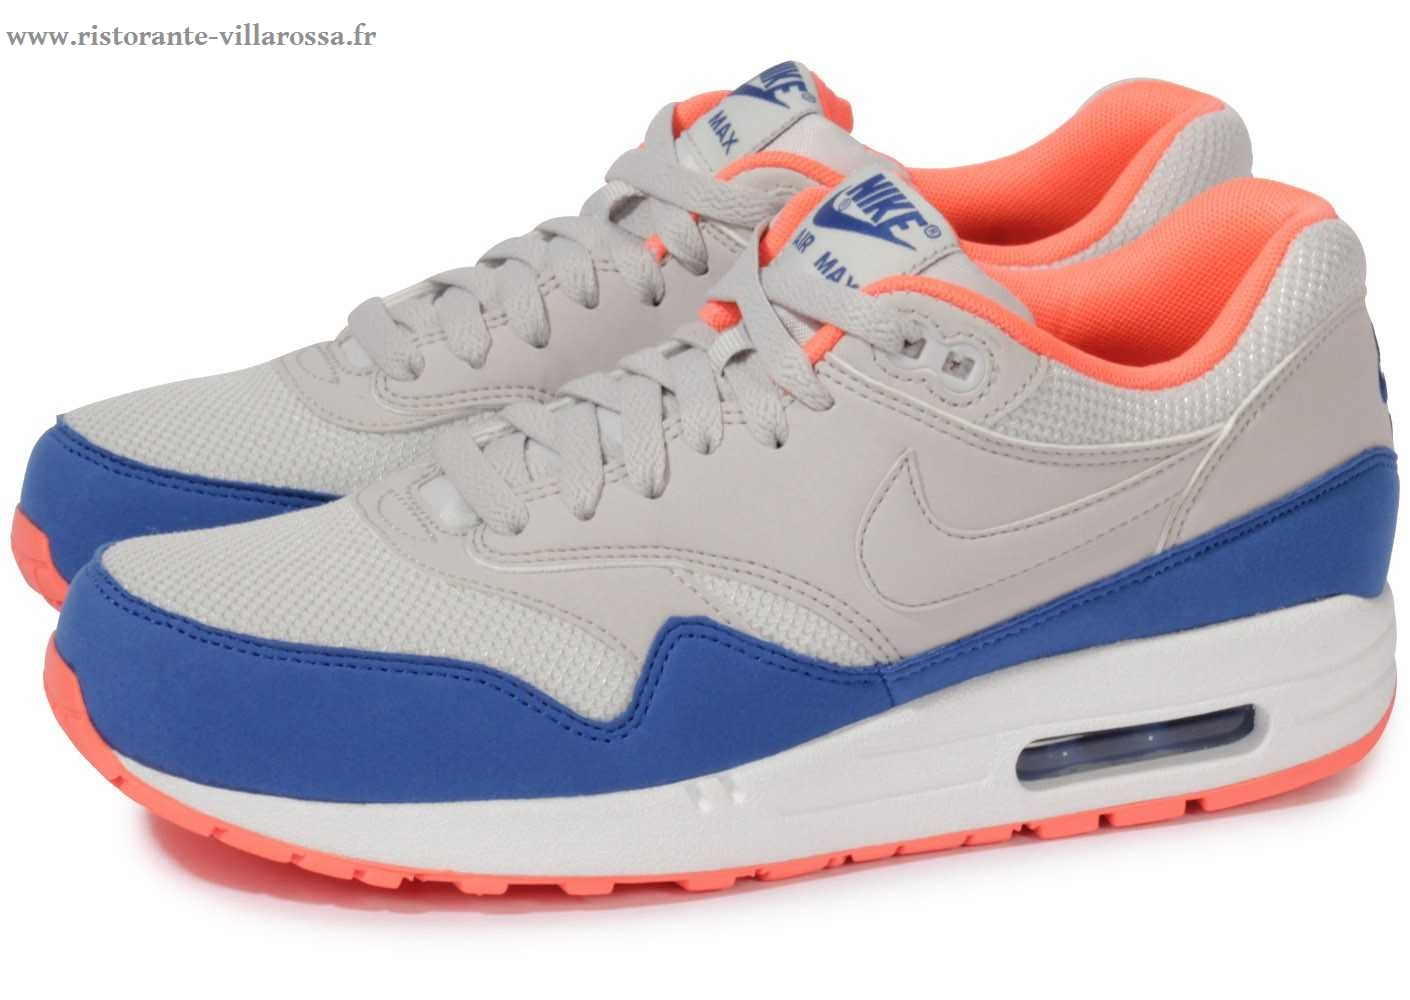 new style 6f99f cb254 ... where can i buy nike air max 1 essential bleu orange f9c1d 0f81c